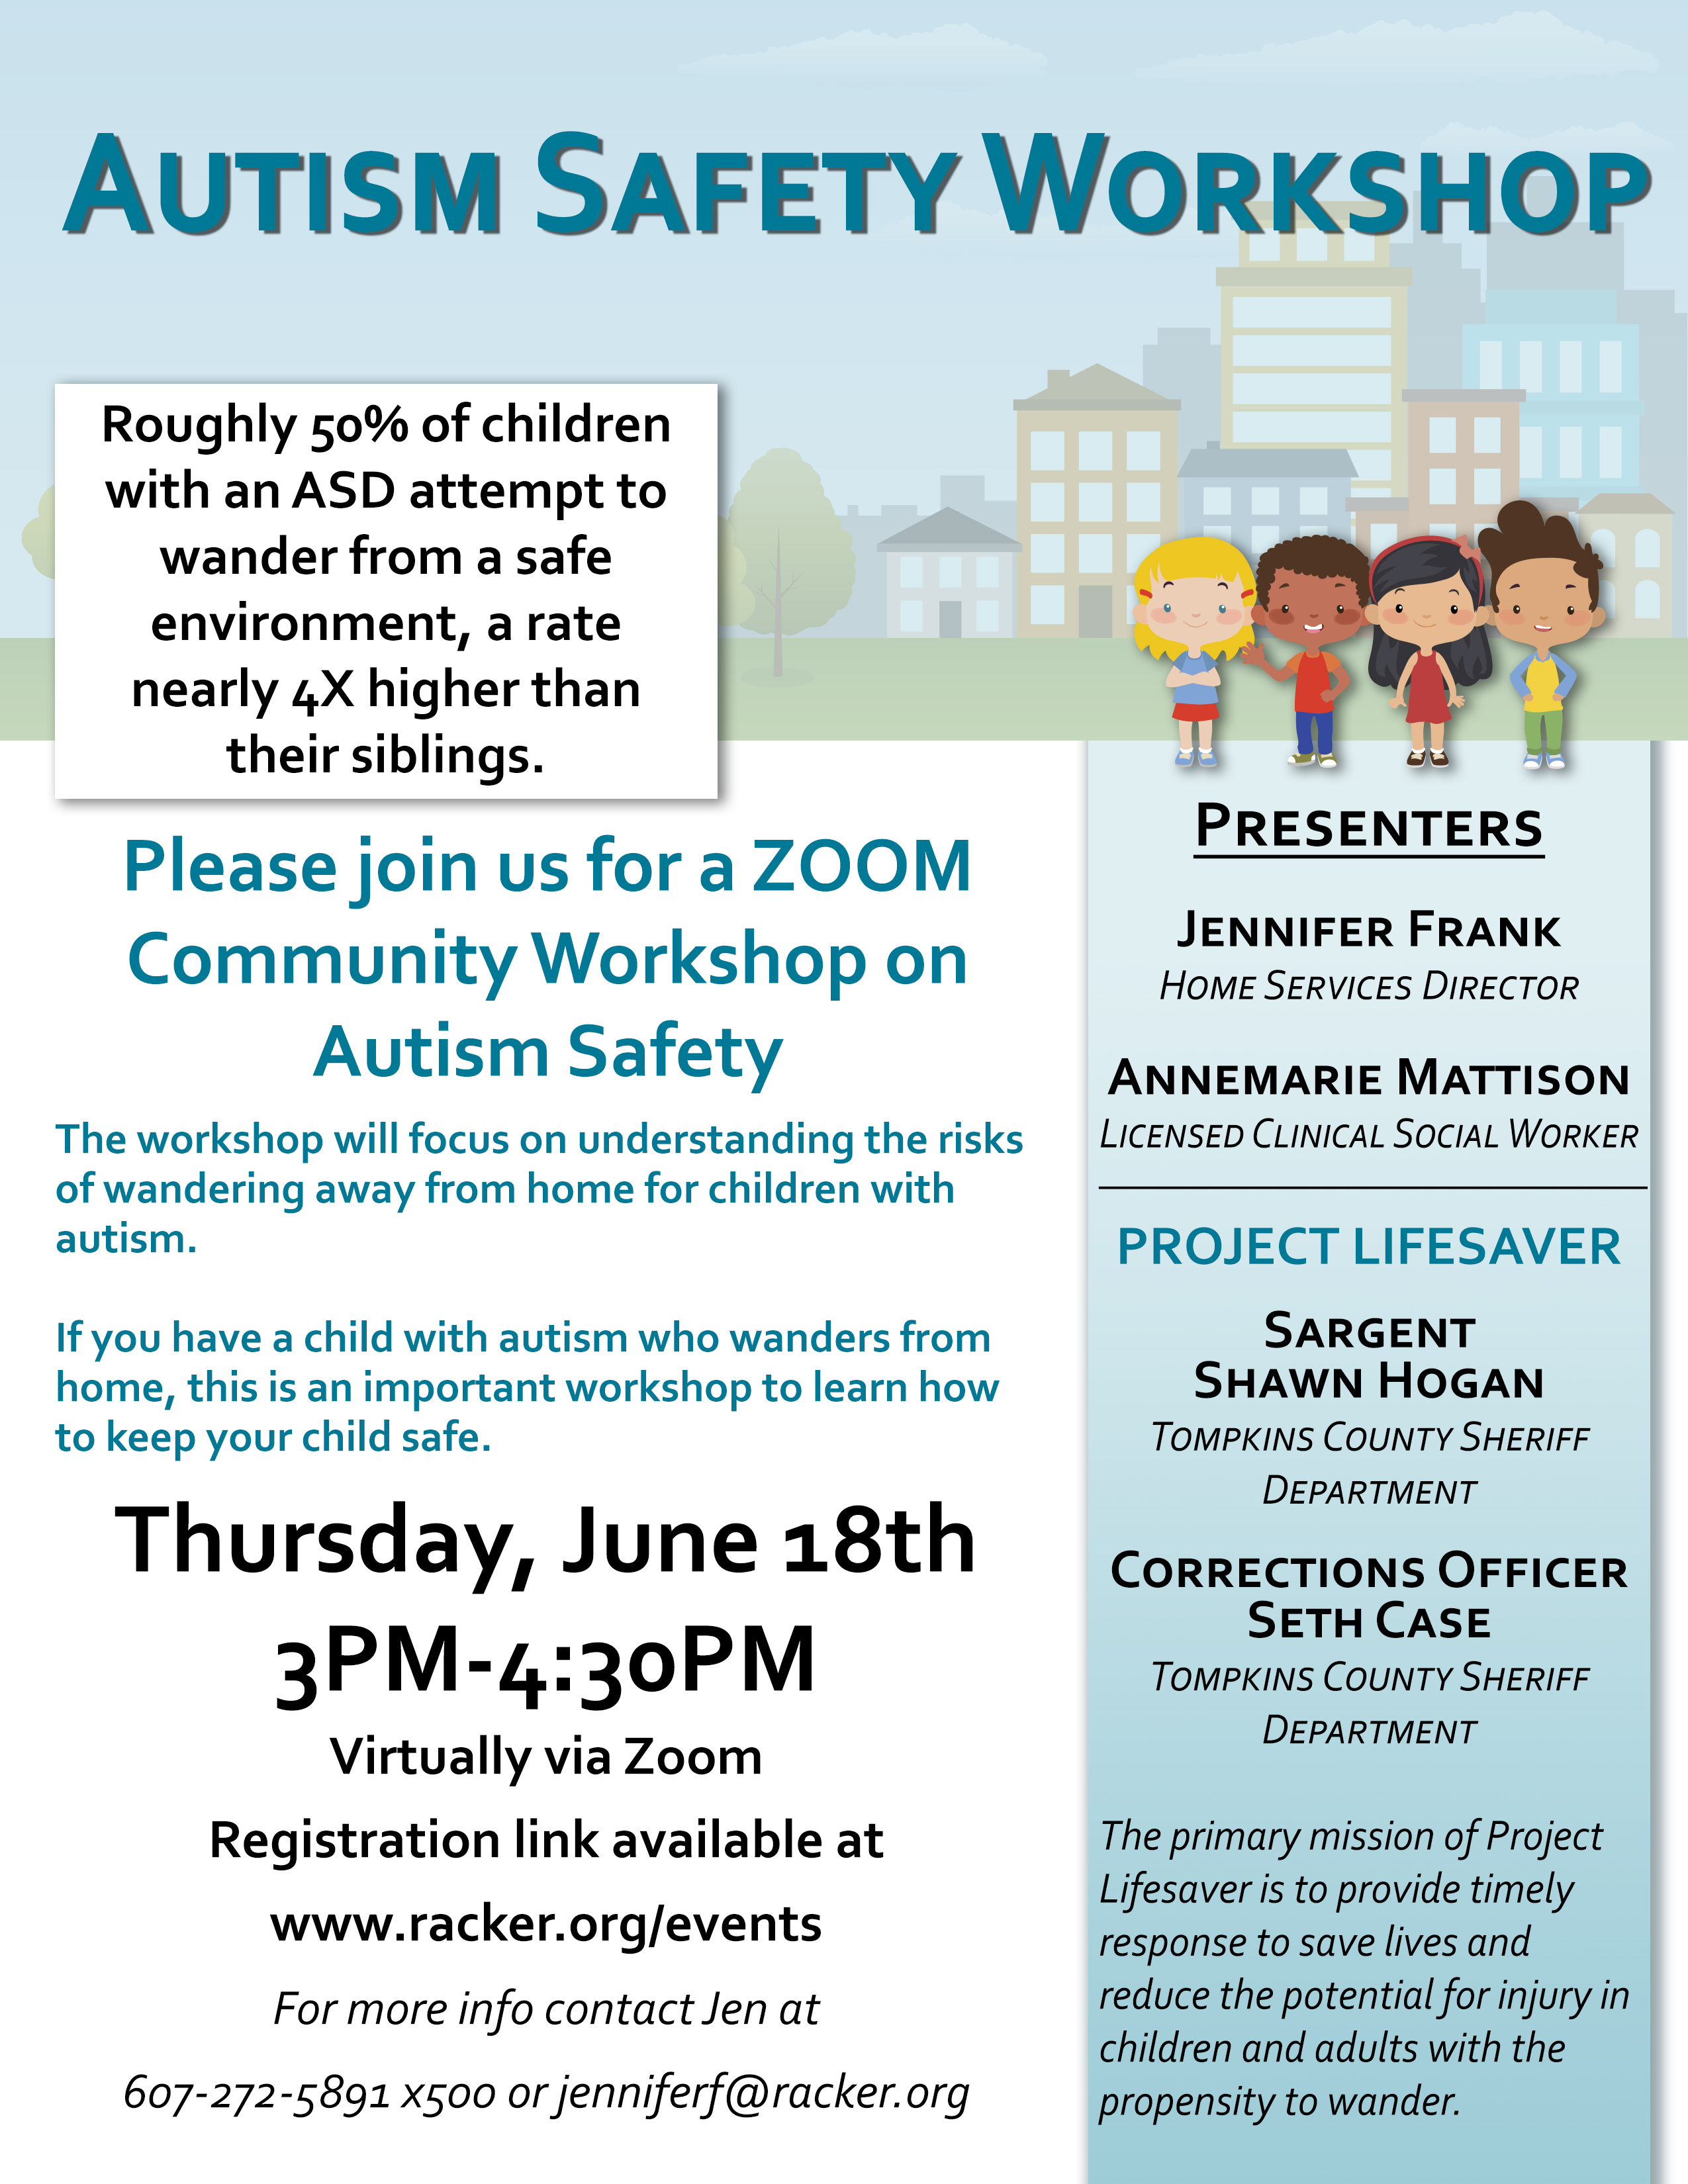 Autism Safety Workshop